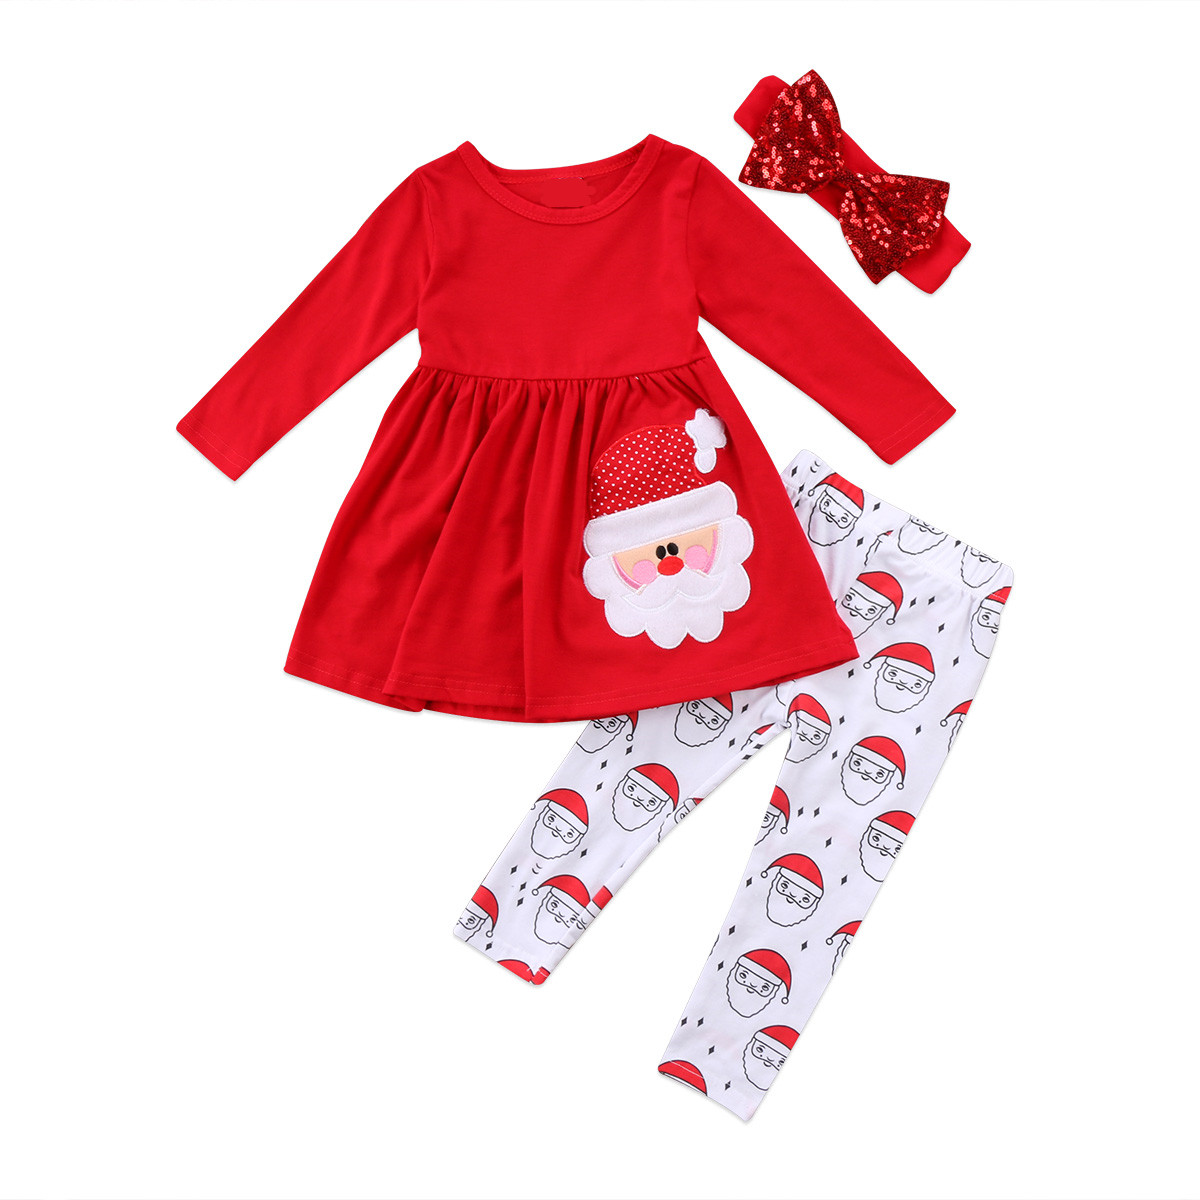 Toddler Kids Baby Girl Christmas Santa Clothes Romper Dress